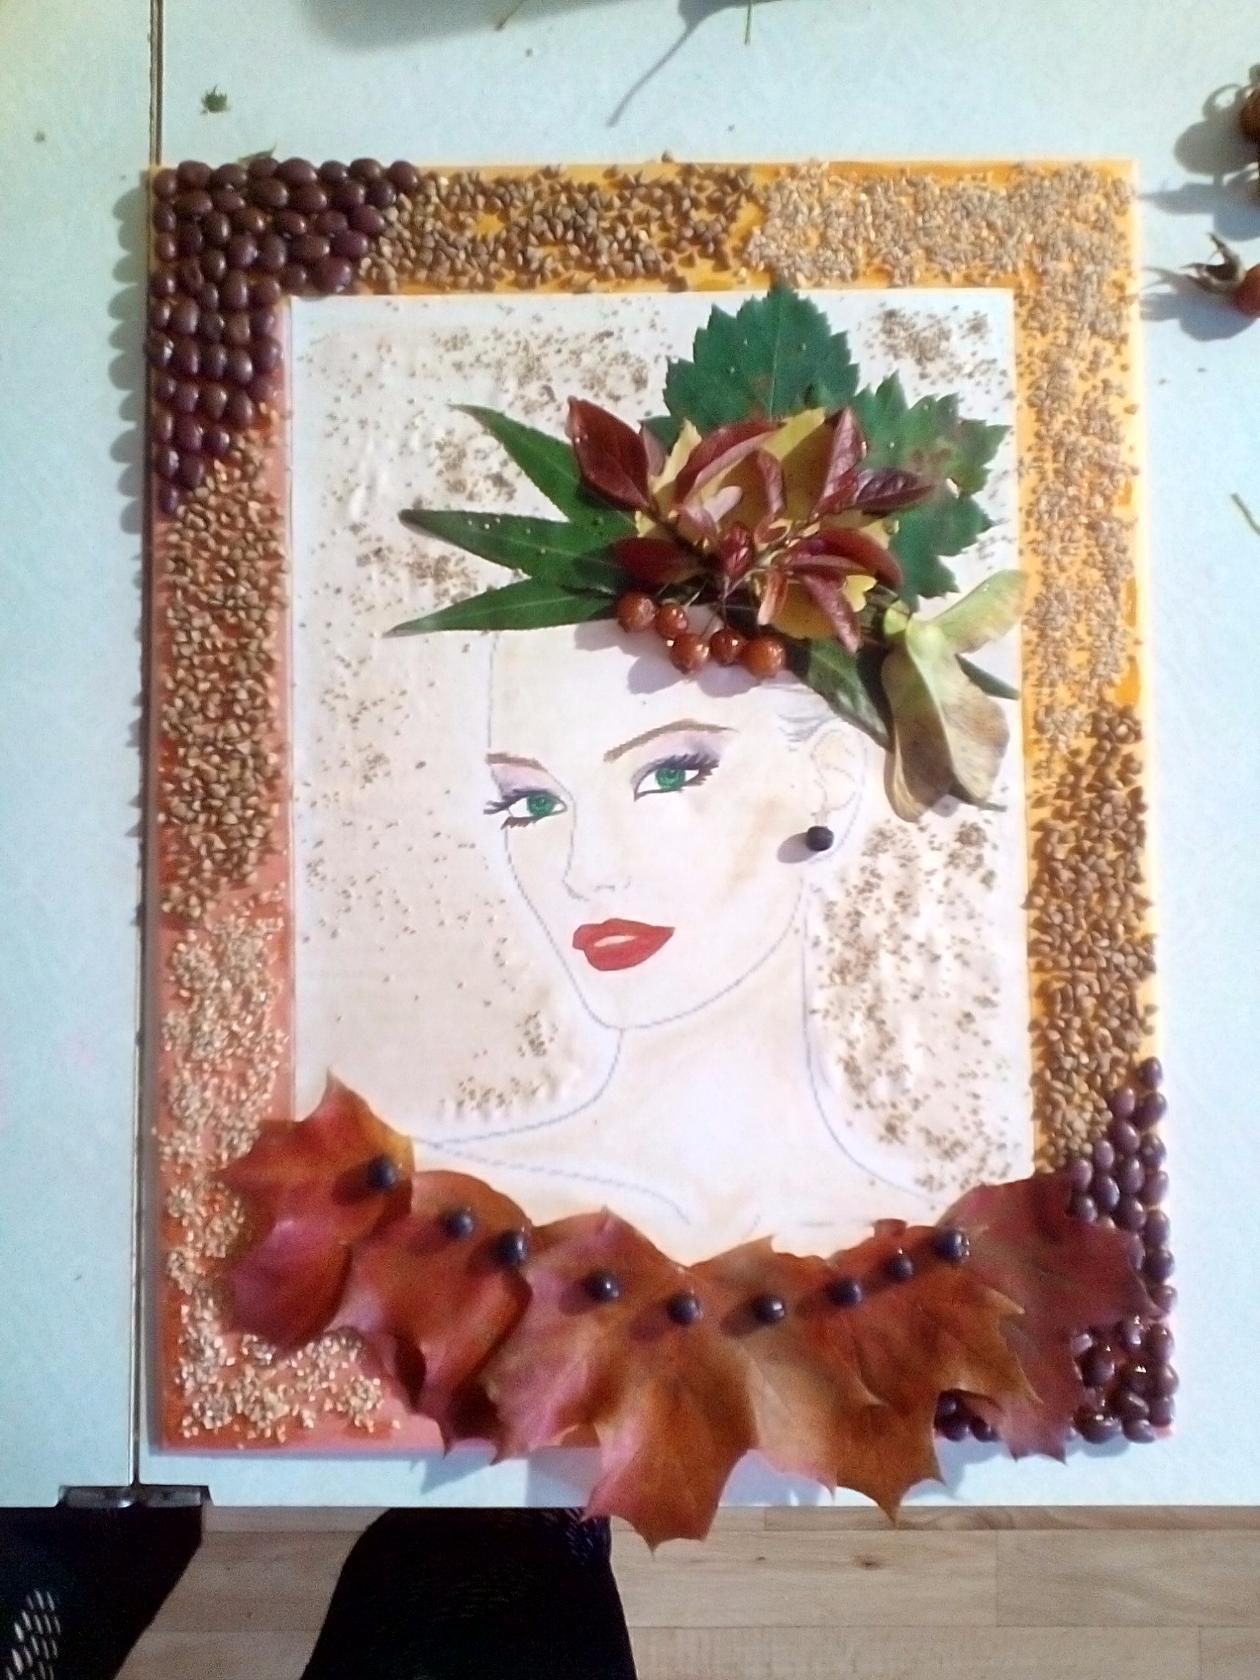 Портрет Осени в женском образе Леди Осень